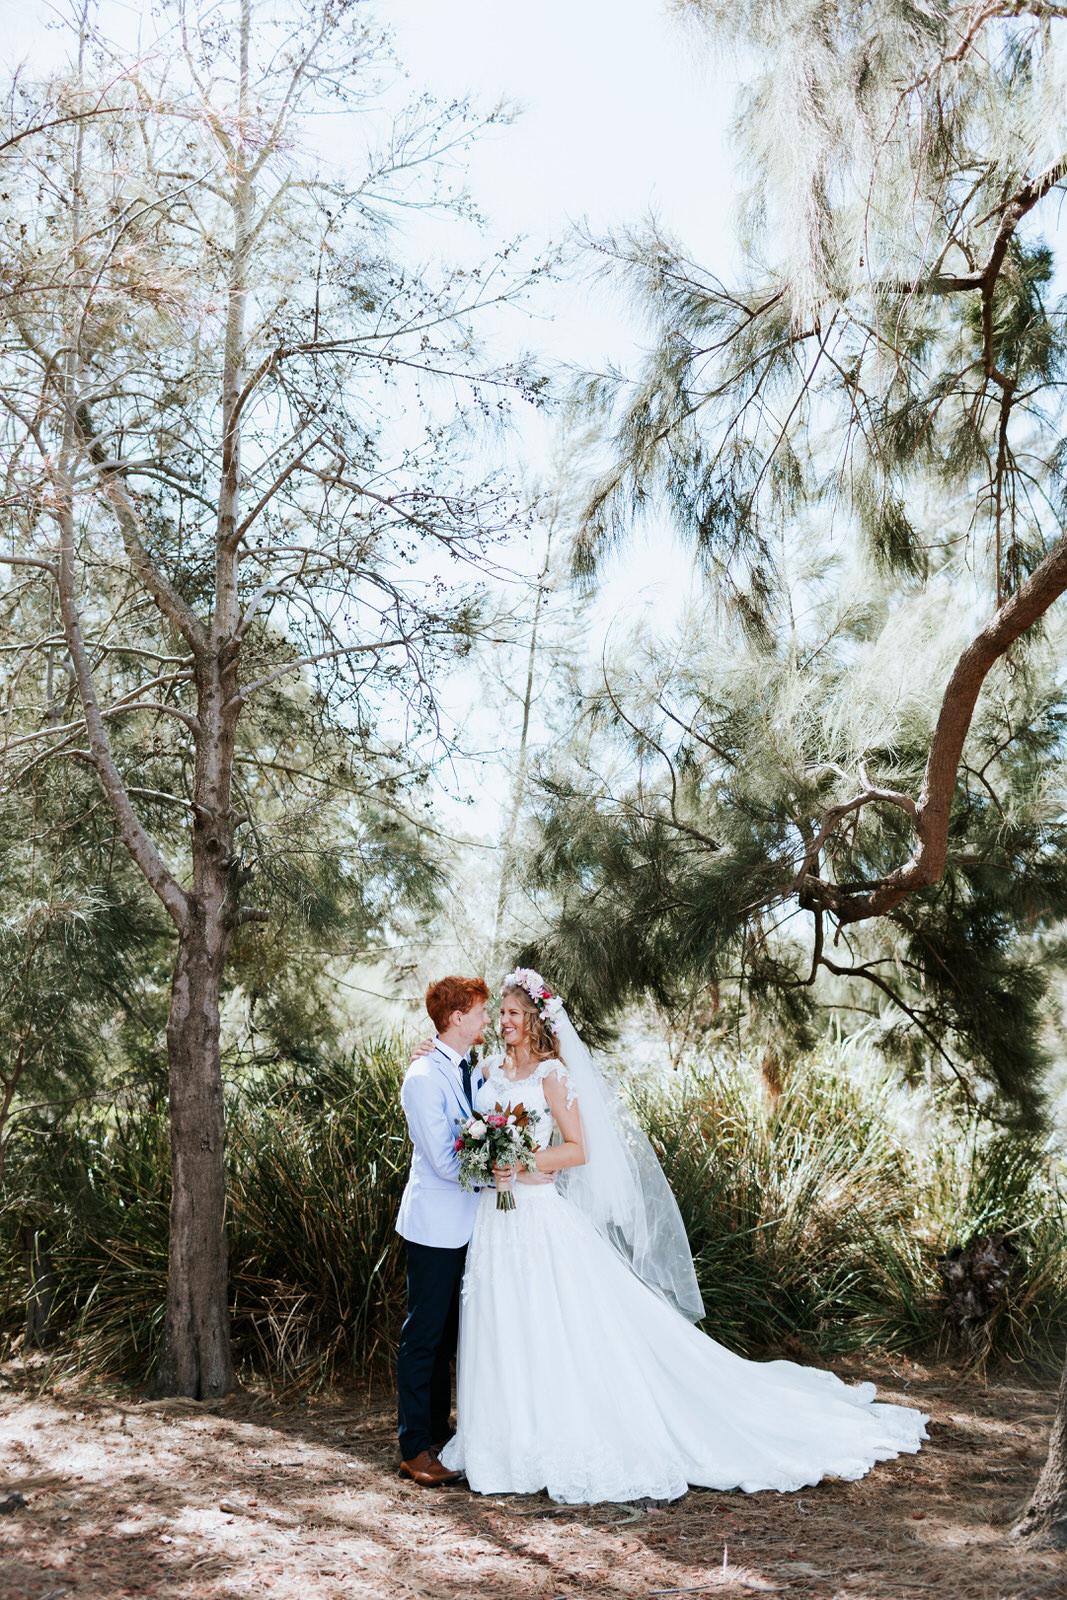 20180414 - Kaylee & Matthew 0217.jpg